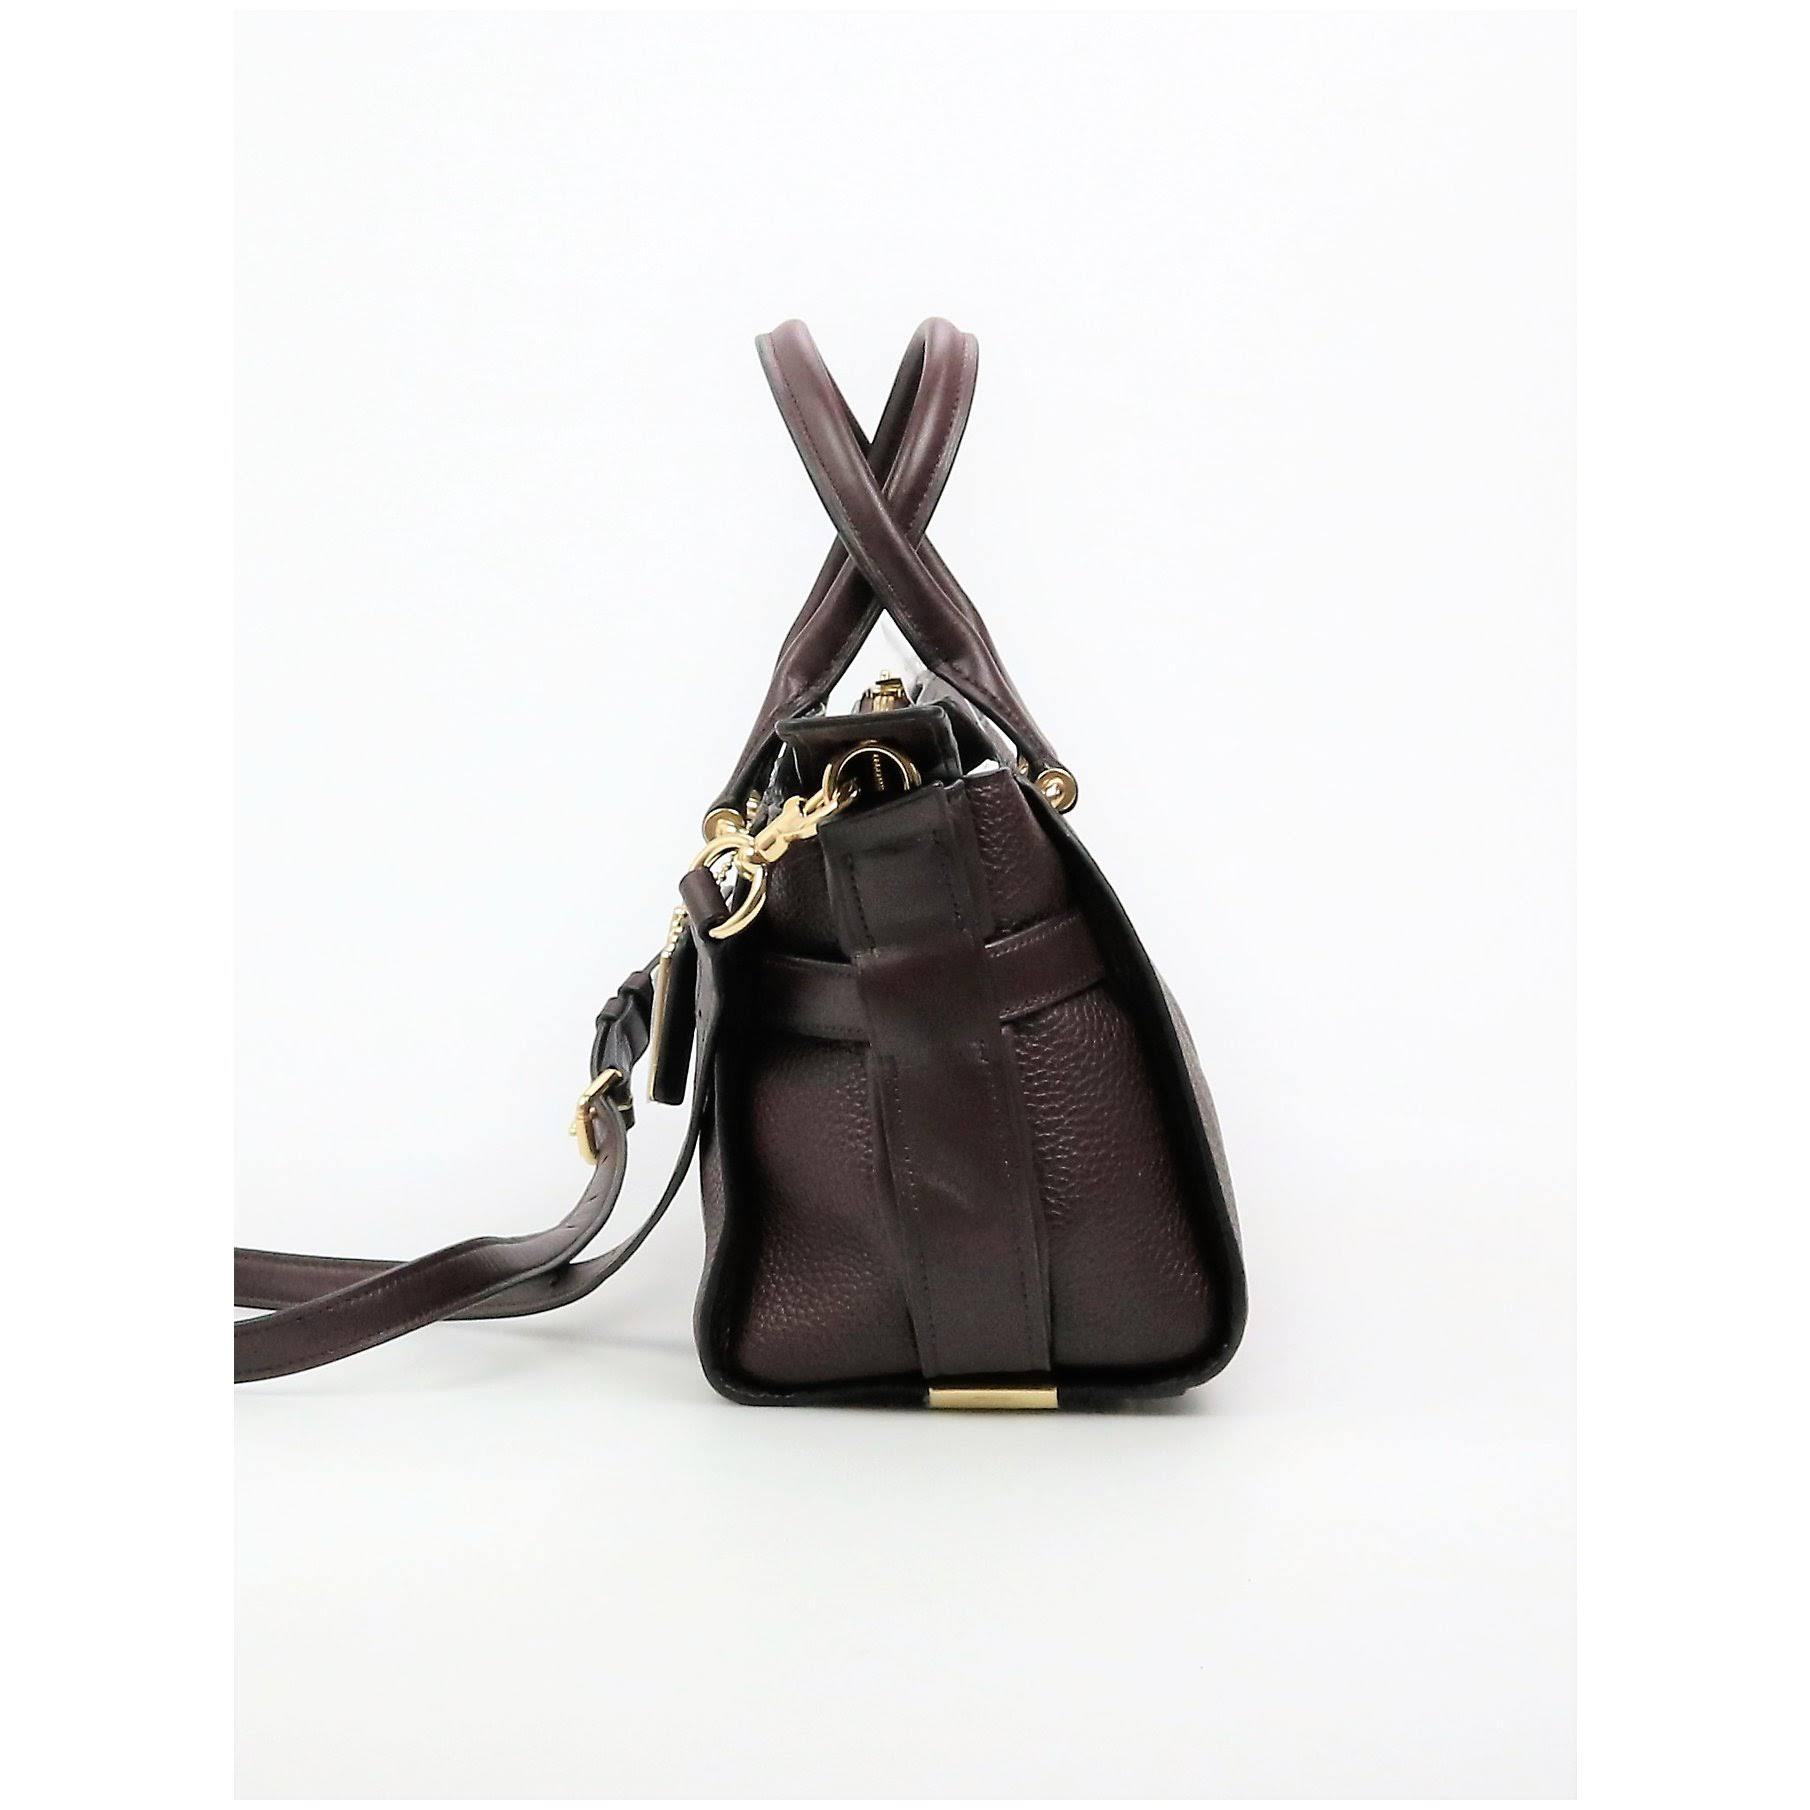 27 Pebble Leather In Swagger Coach Oxblood dxshCBrtQ